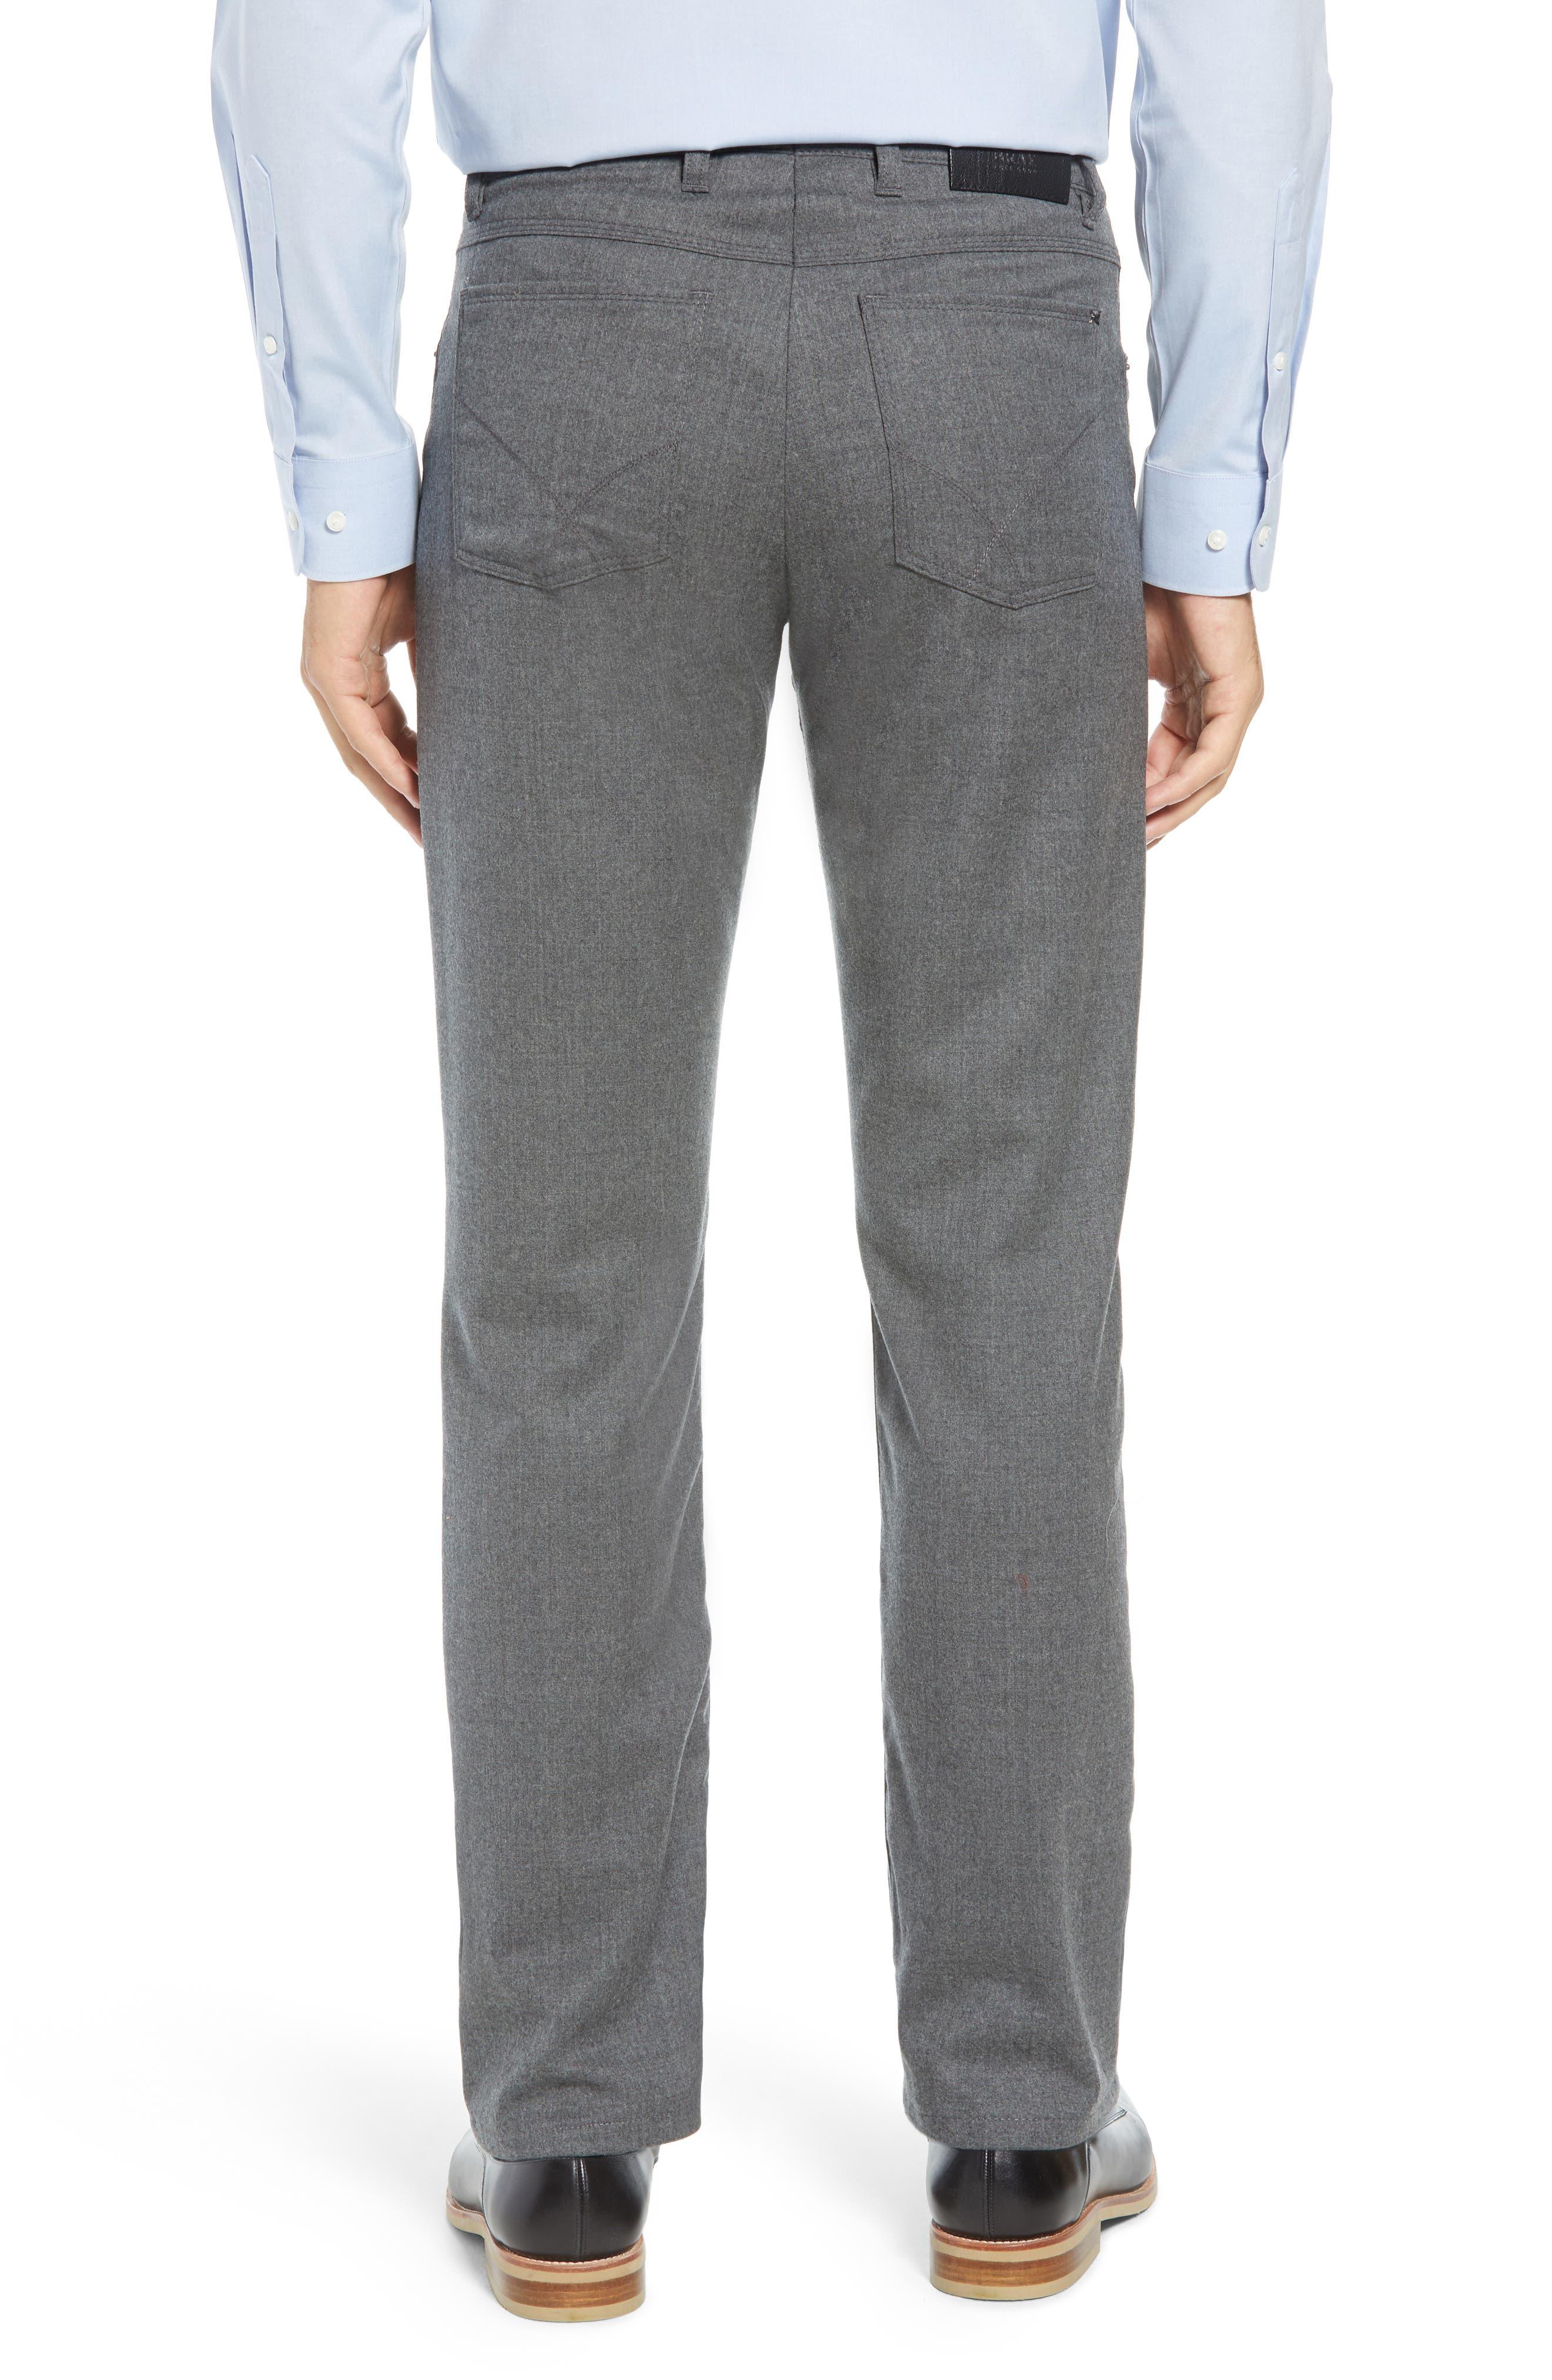 Enrico Five-Pocket Stretch Wool Trousers,                             Alternate thumbnail 2, color,                             GRAPHITE